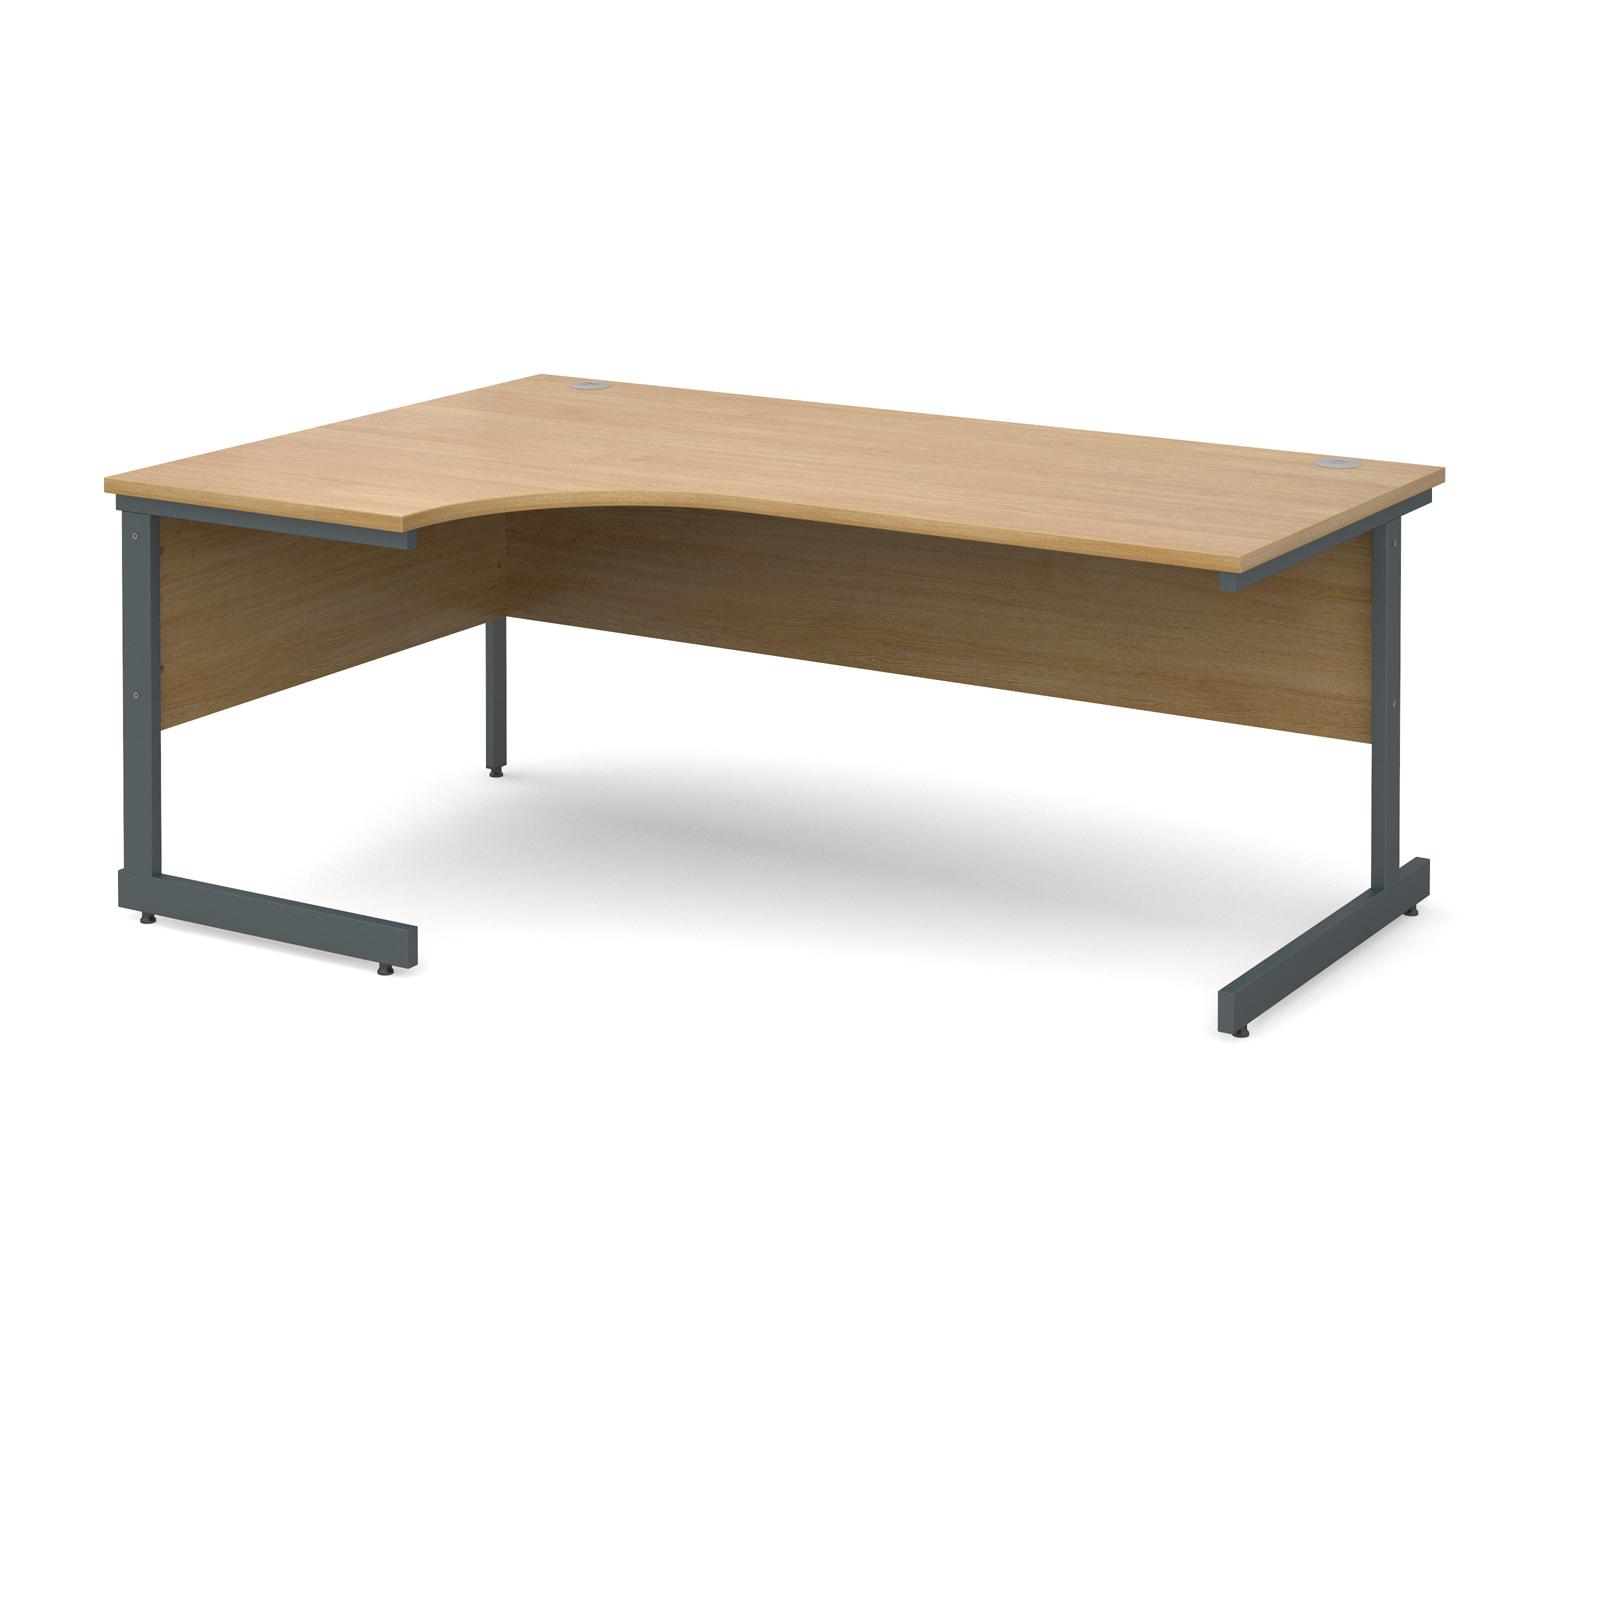 Contract 25 left hand ergonomic desk 1800mm - graphite cantilever frame, oak top